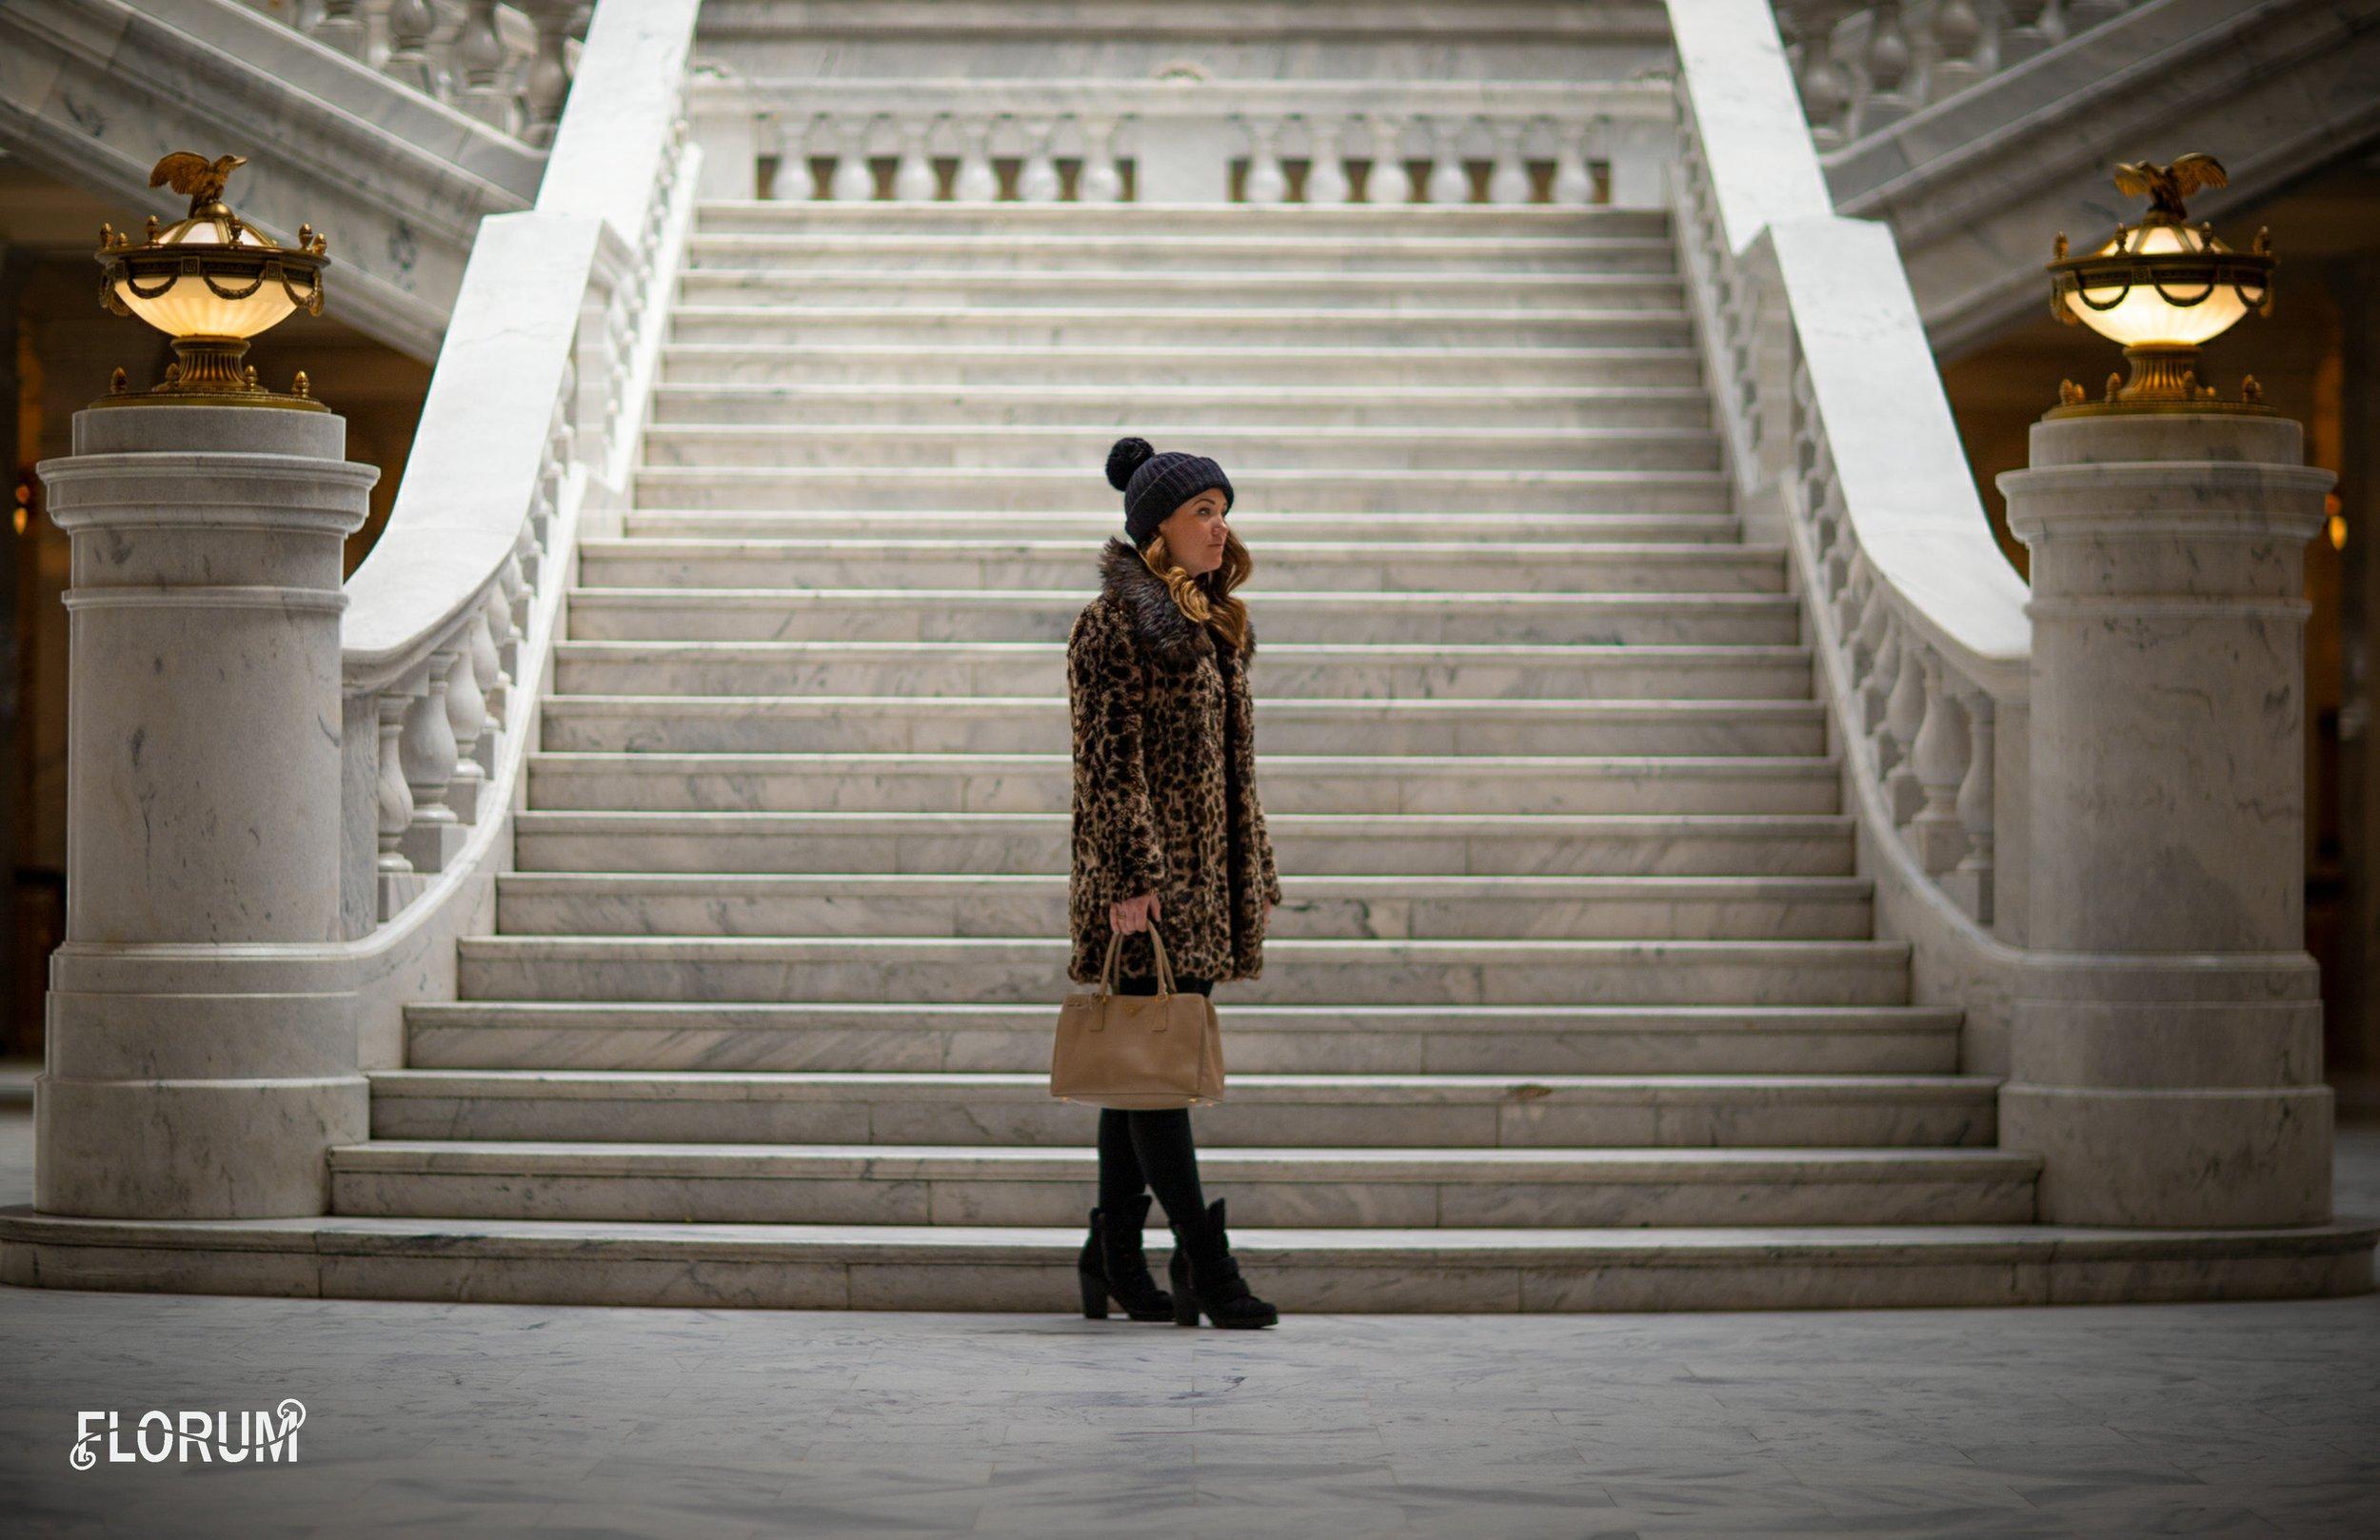 Salt Lake City - Hotel Monaco - Florum Fashion Magazine - Bobby Swingler - Ethical winter fashion - eco travel - noelle lynne05.jpg